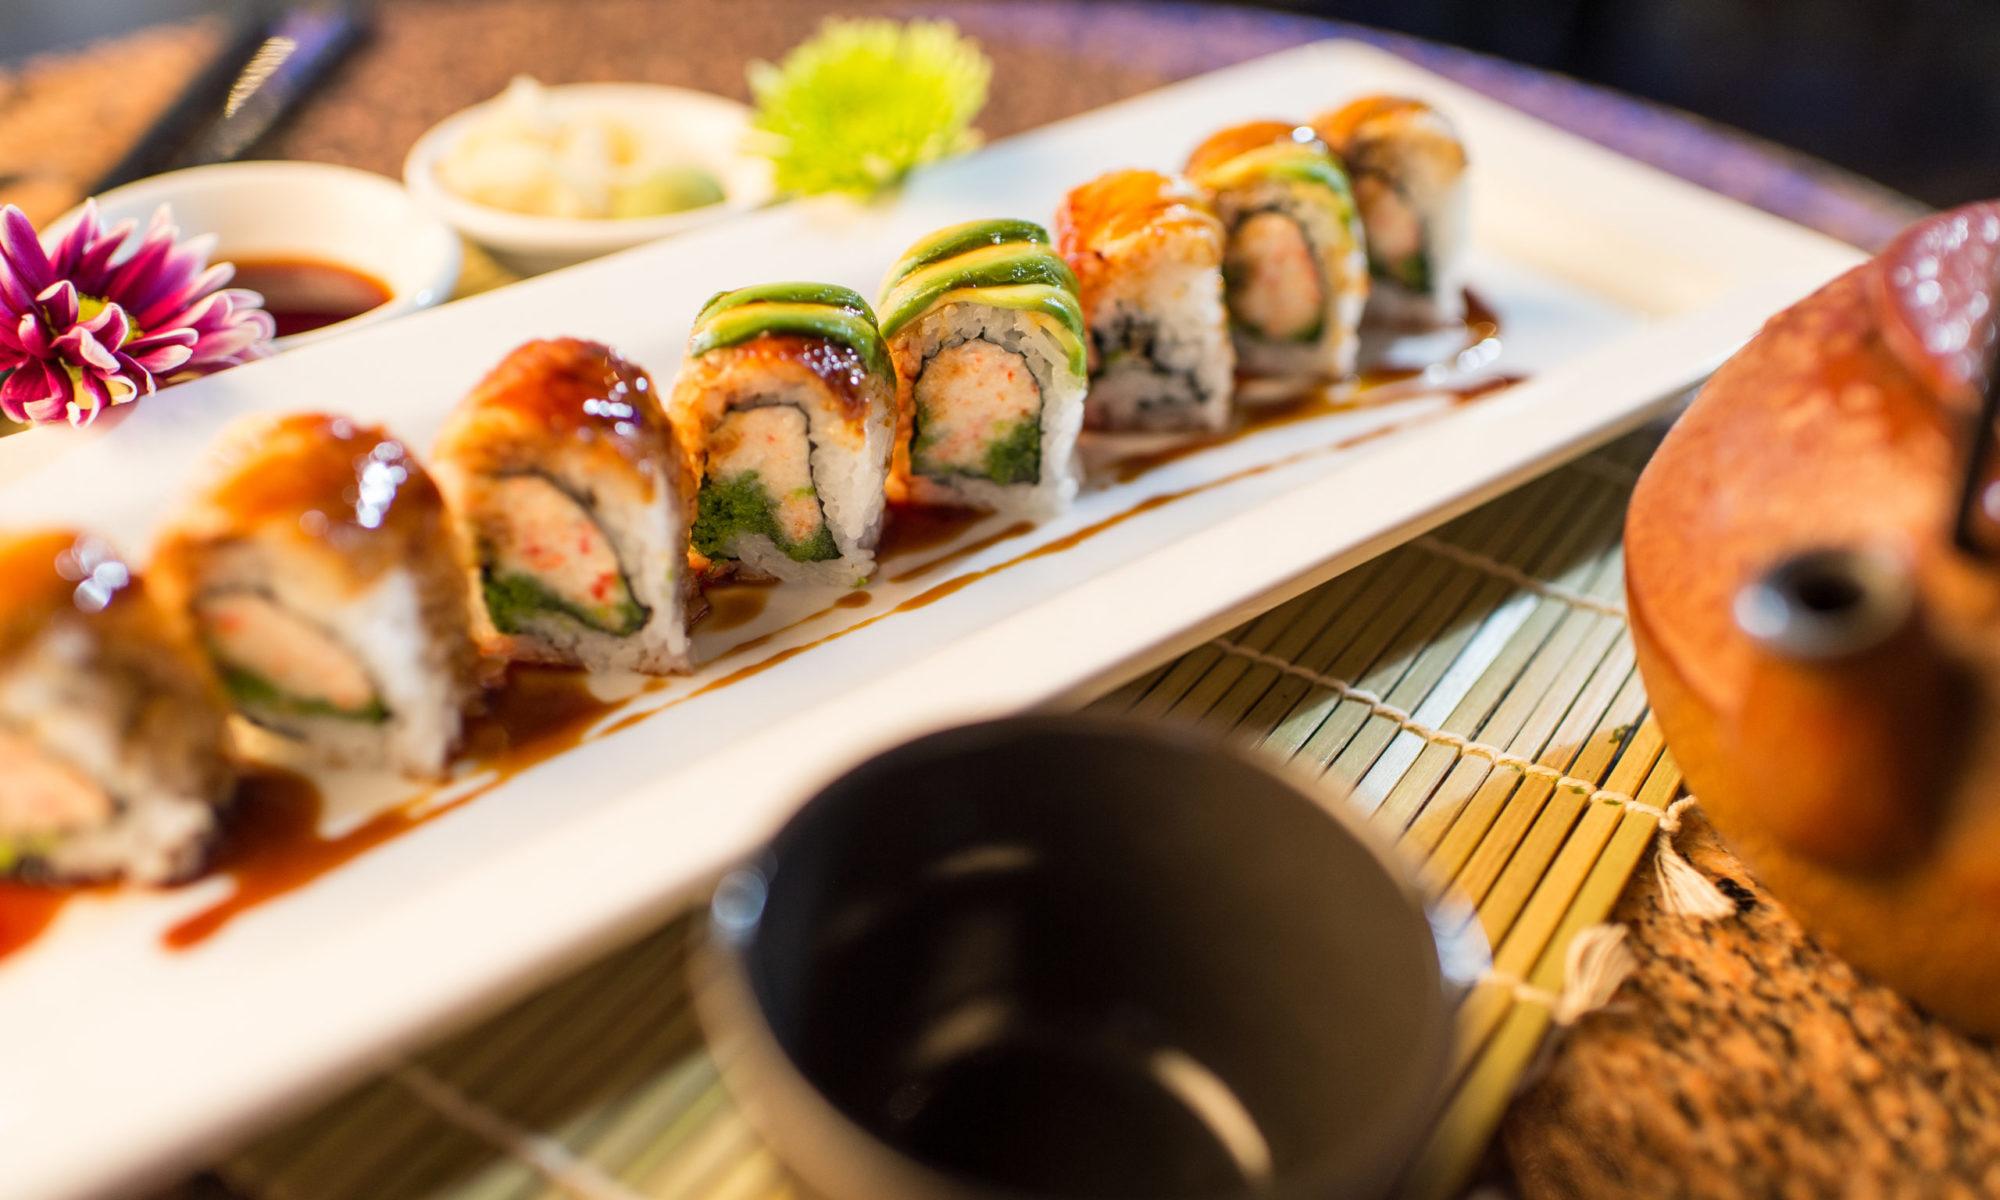 Sodo Sushi Bar & Grill